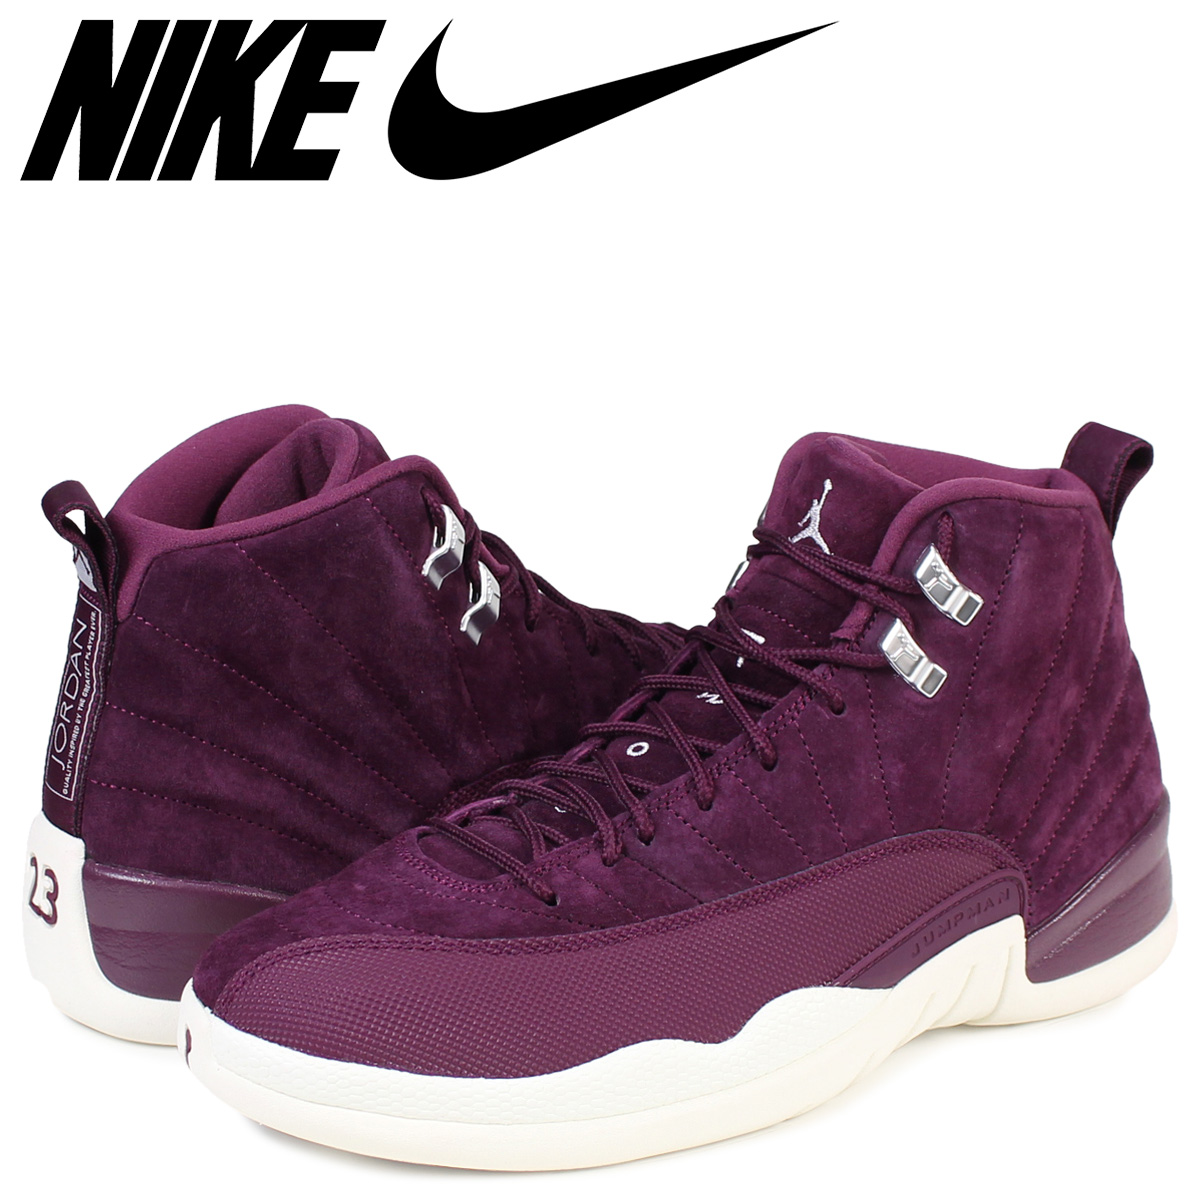 Whats up Sports  NIKE AIR JORDAN 12 RETRO Nike Air Jordan 12 ... 8f6a5bac18